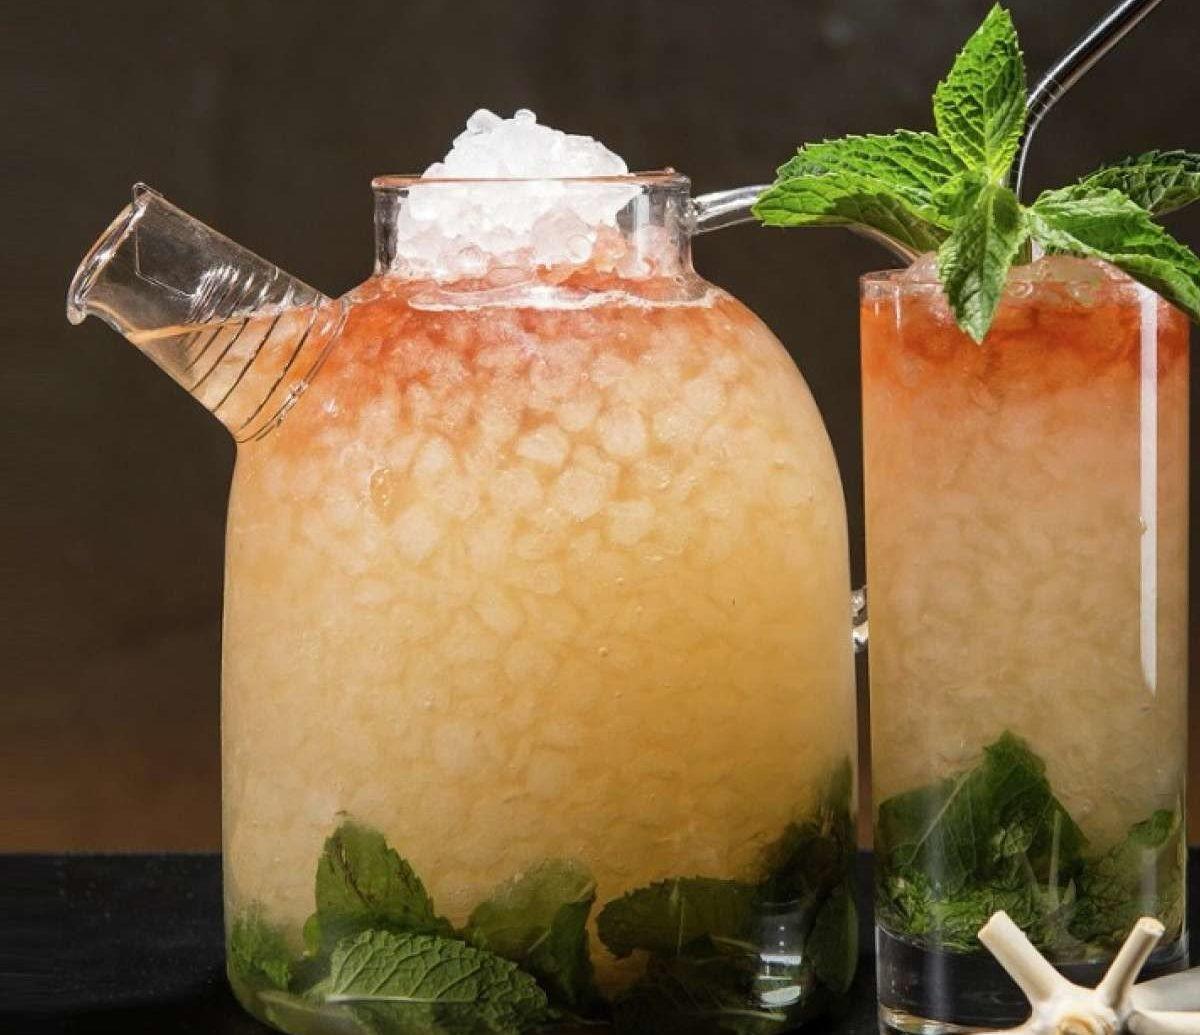 Food + Drink Drink mint julep cocktail alcoholic beverage mojito food mai tai caipirinha produce limeade distilled beverage coconut citrus flowering plant